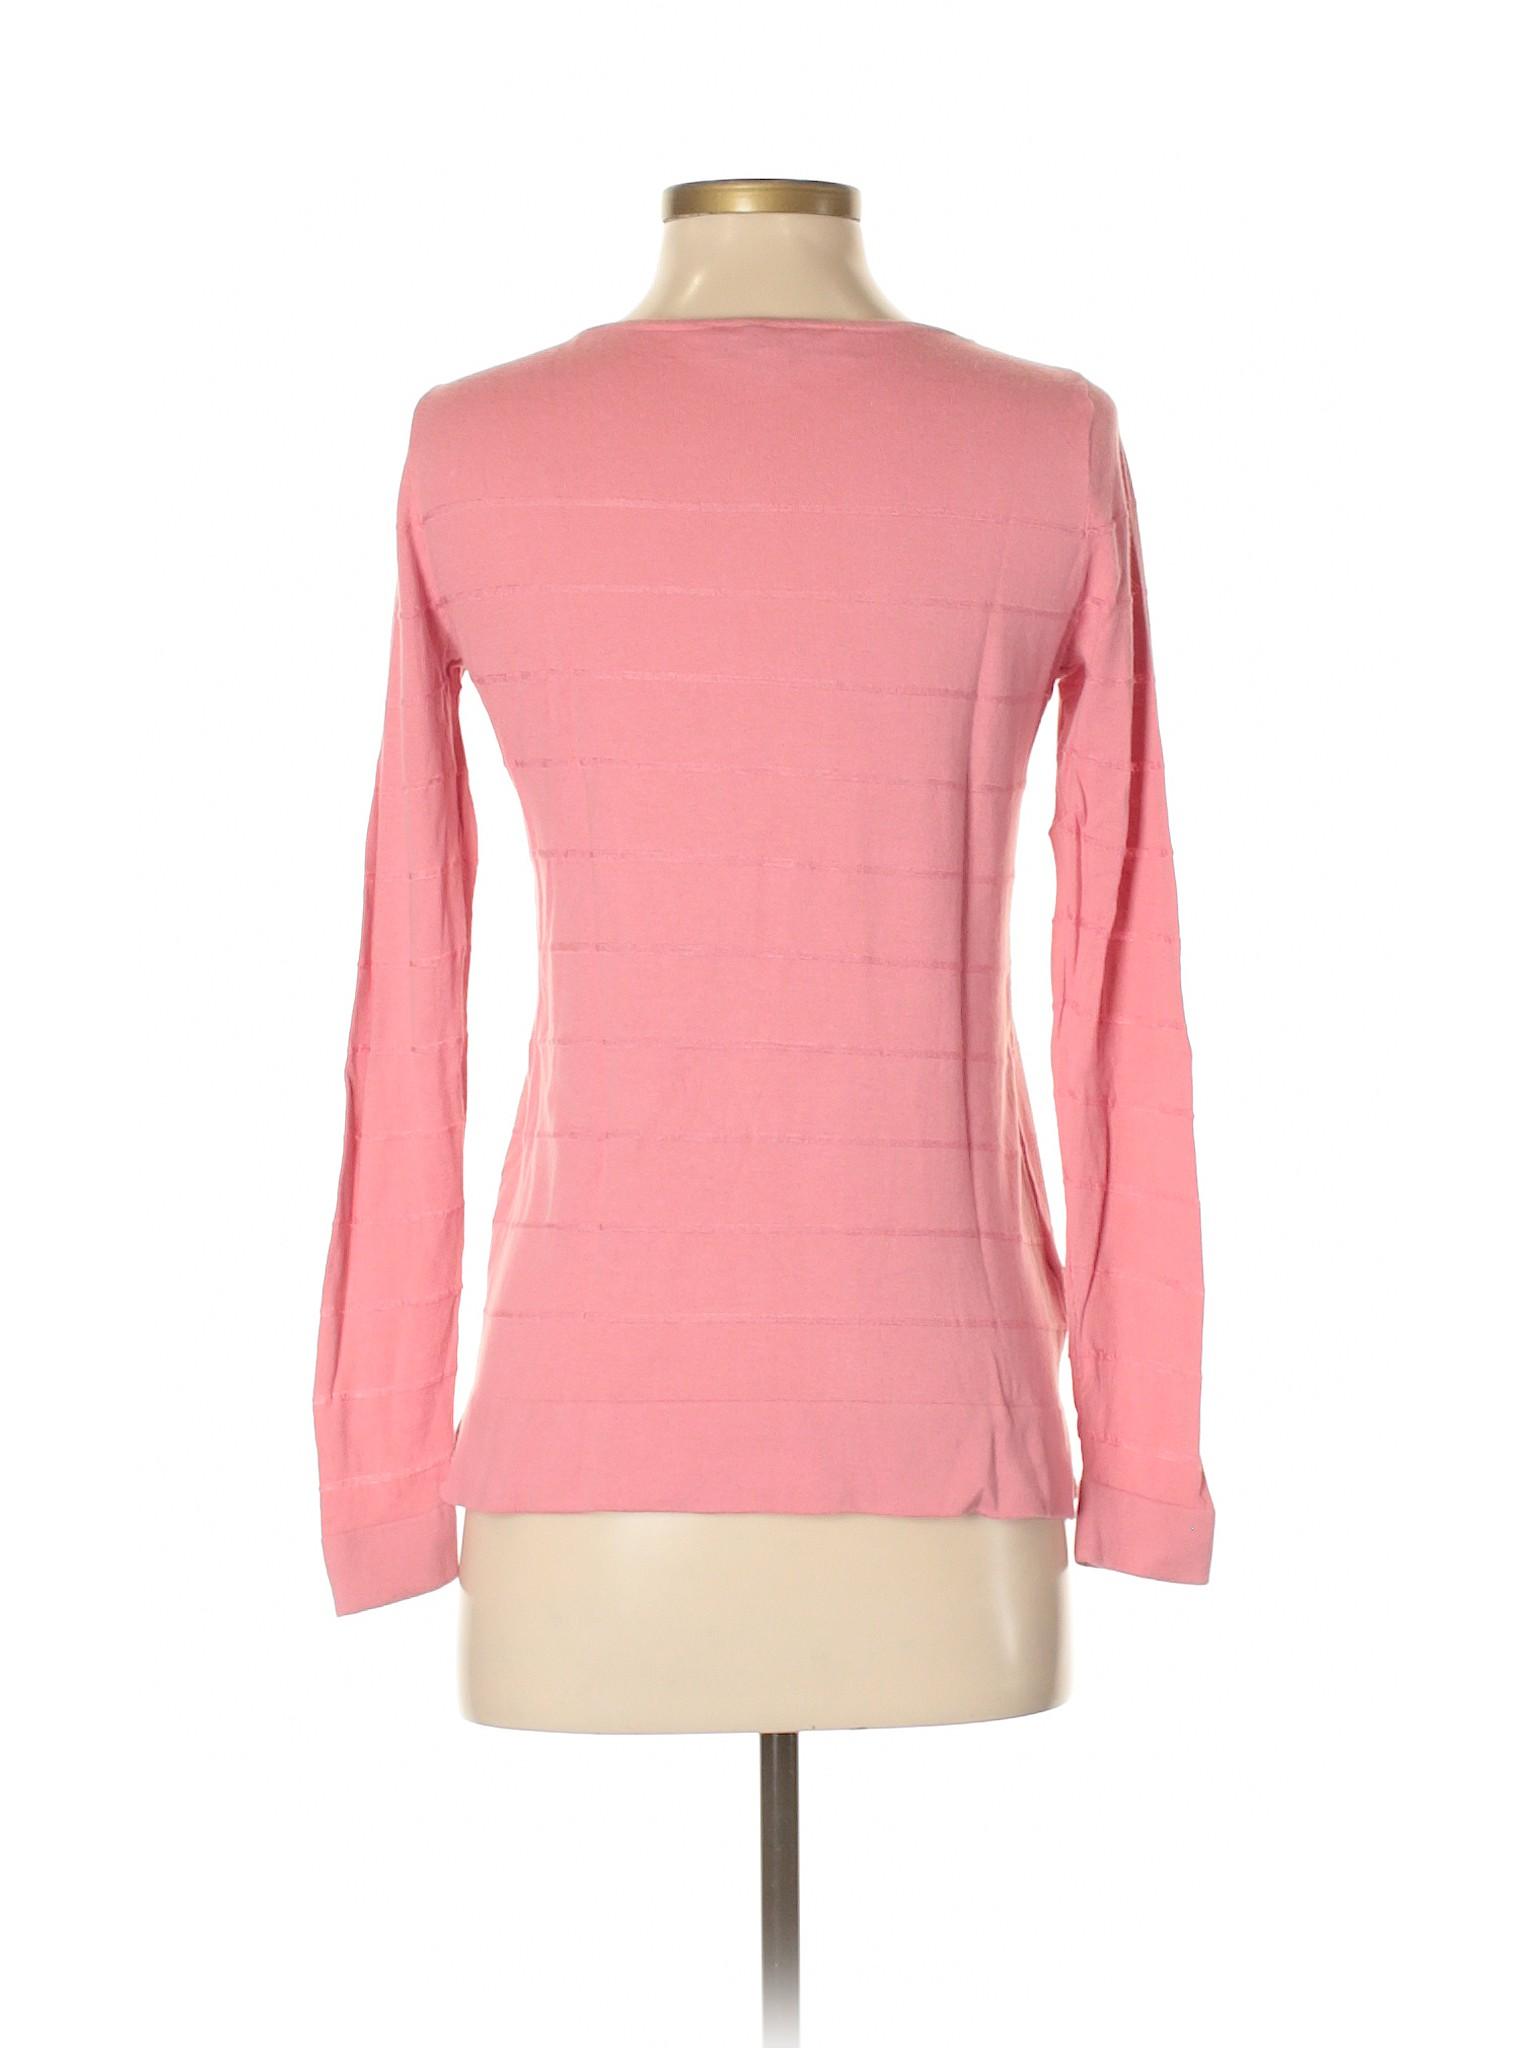 Boutique Sweater Taylor Pullover Ann LOFT rZqrO